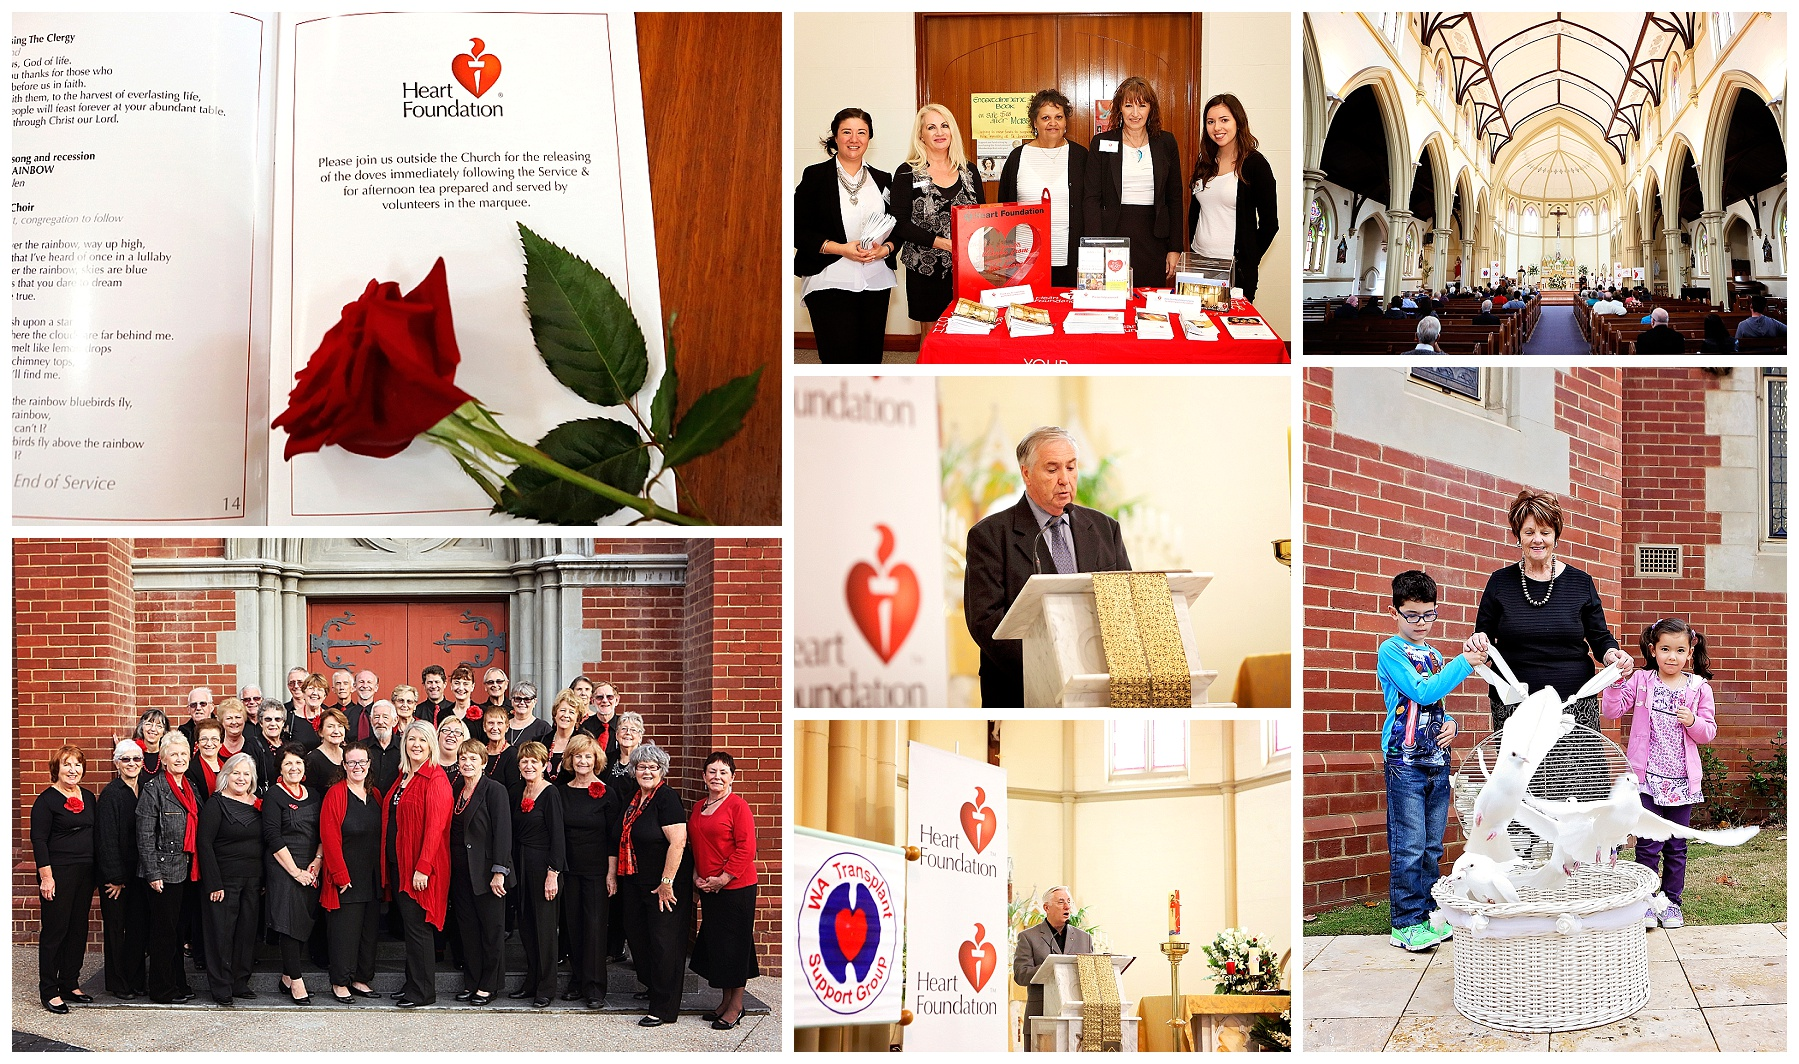 Heart Foundation Memorial Service